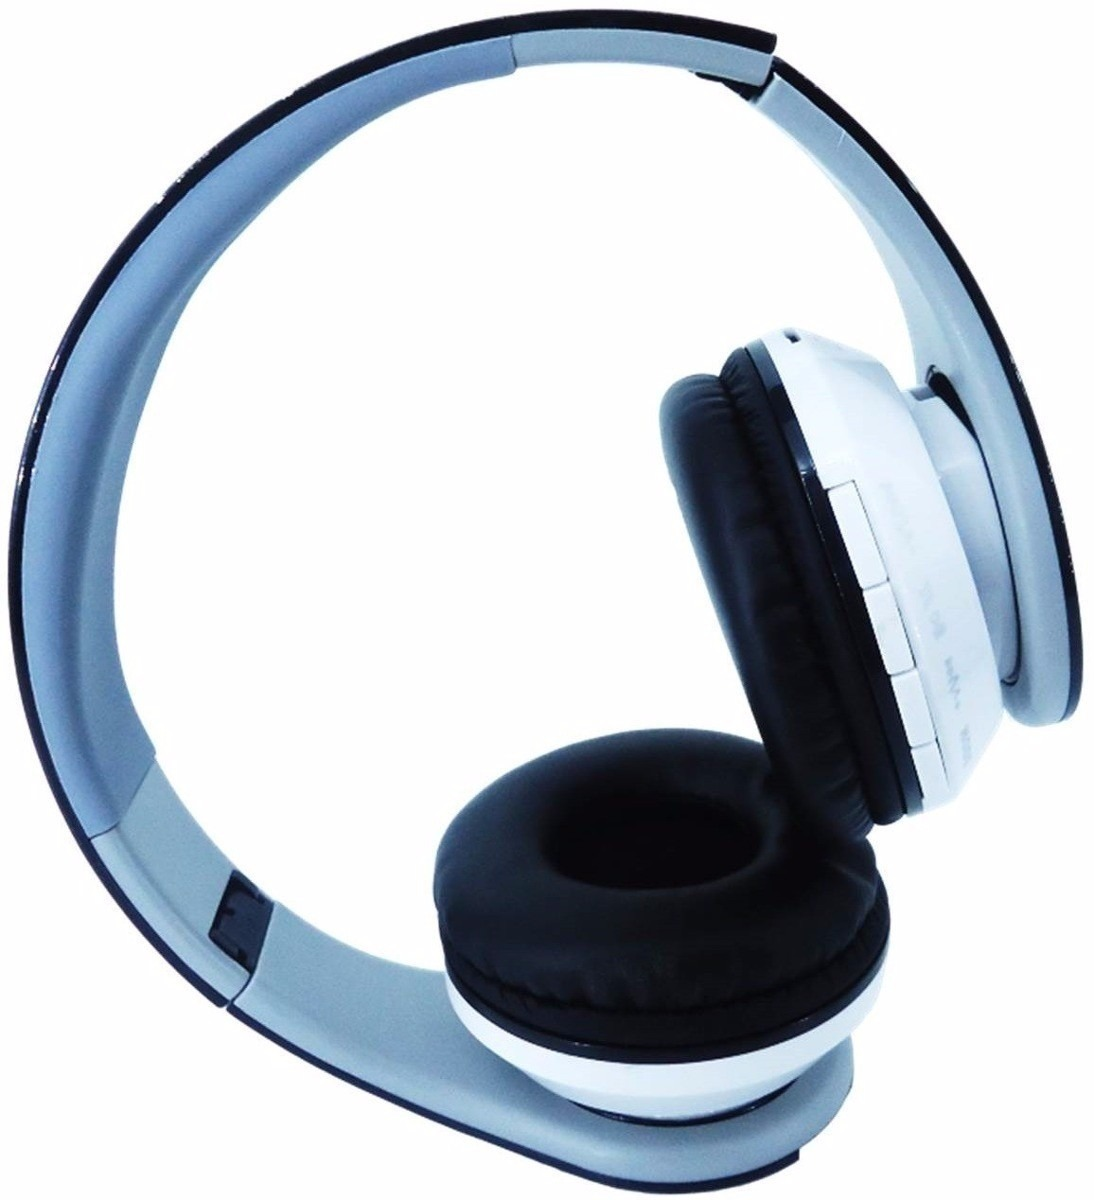 Fone Ouvido Favix Fx-b01 B01 Fm Sd Card Hi-Wi Mega Bass Bluetooth Original  - HARDFAST INFORMÁTICA